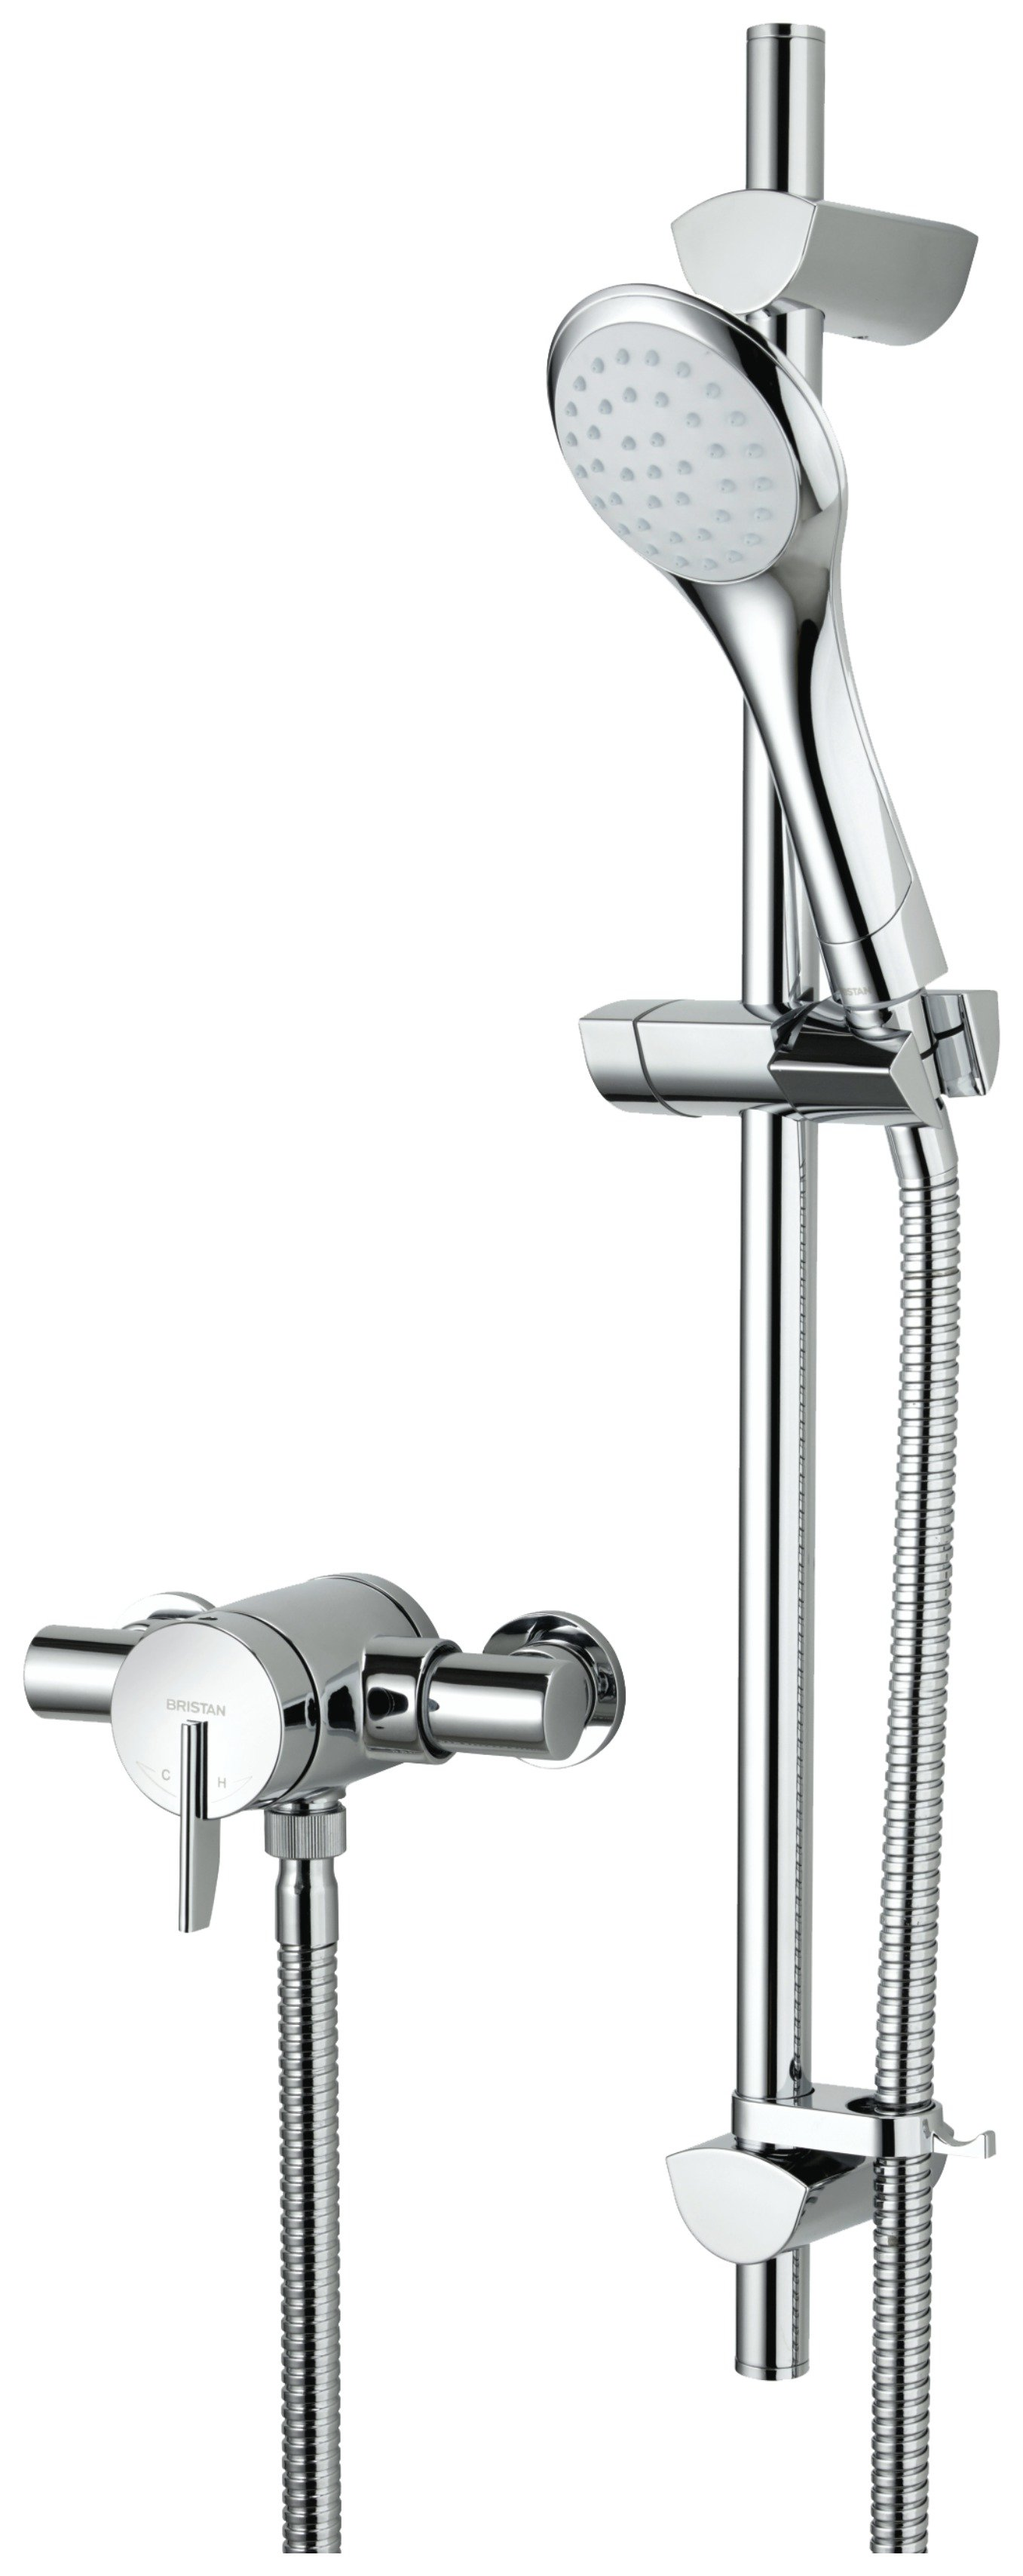 Bristan Sonique Chrome Thermostatic Sequential Mixer Shower